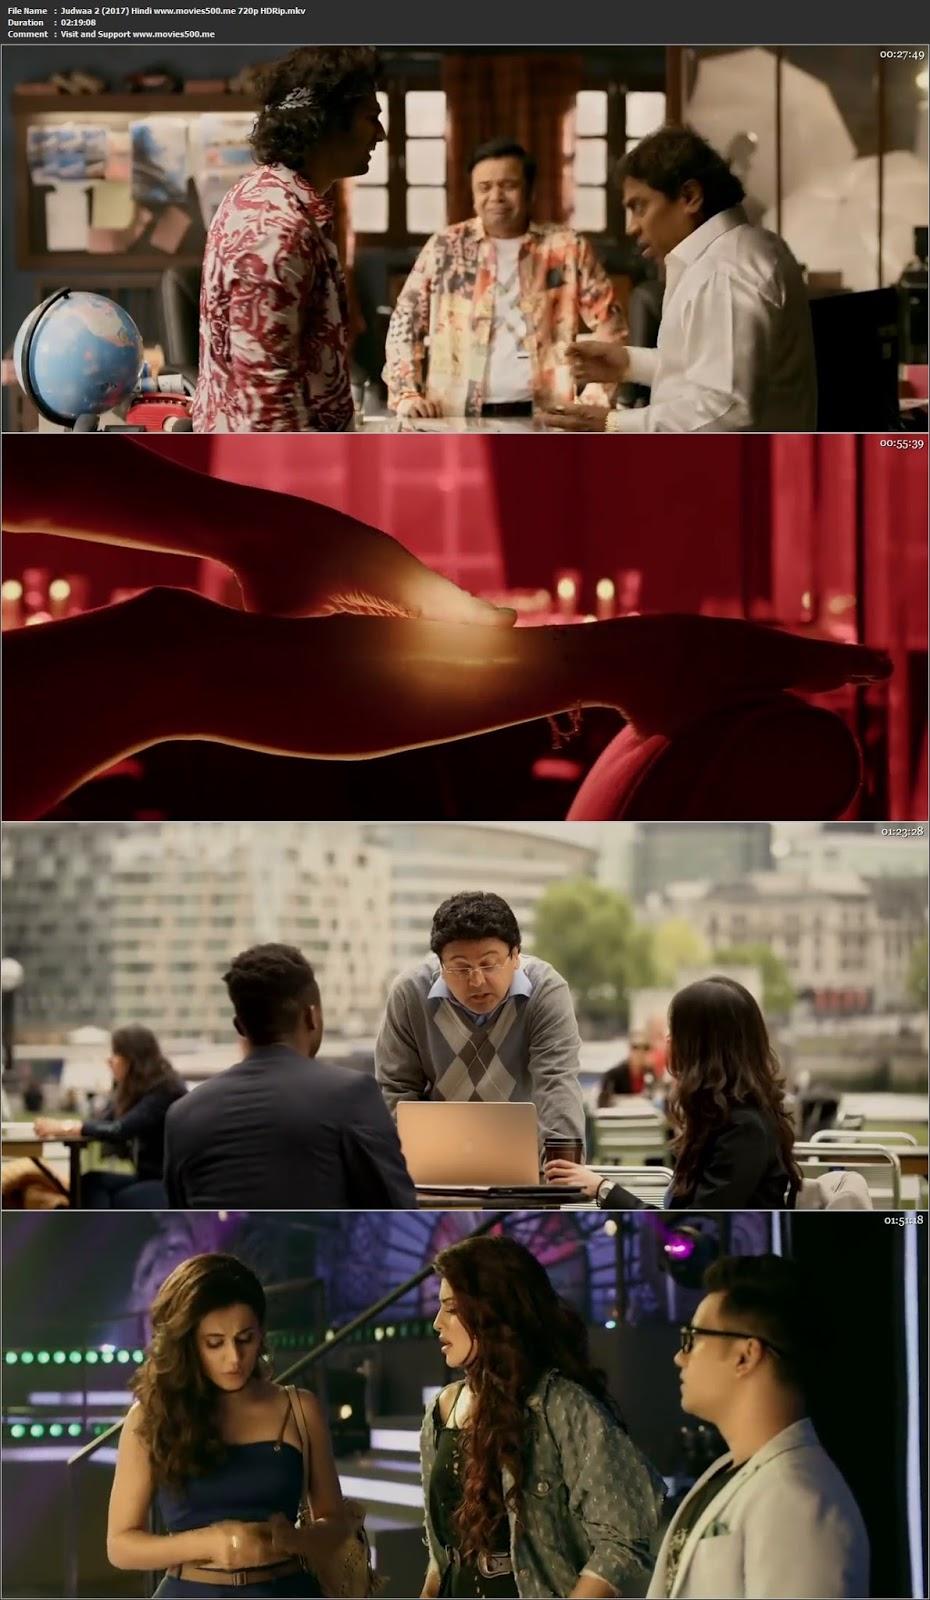 Judwaa 2 2017 Hindi Full Movie HDRip 720p 1GB at movies500.info